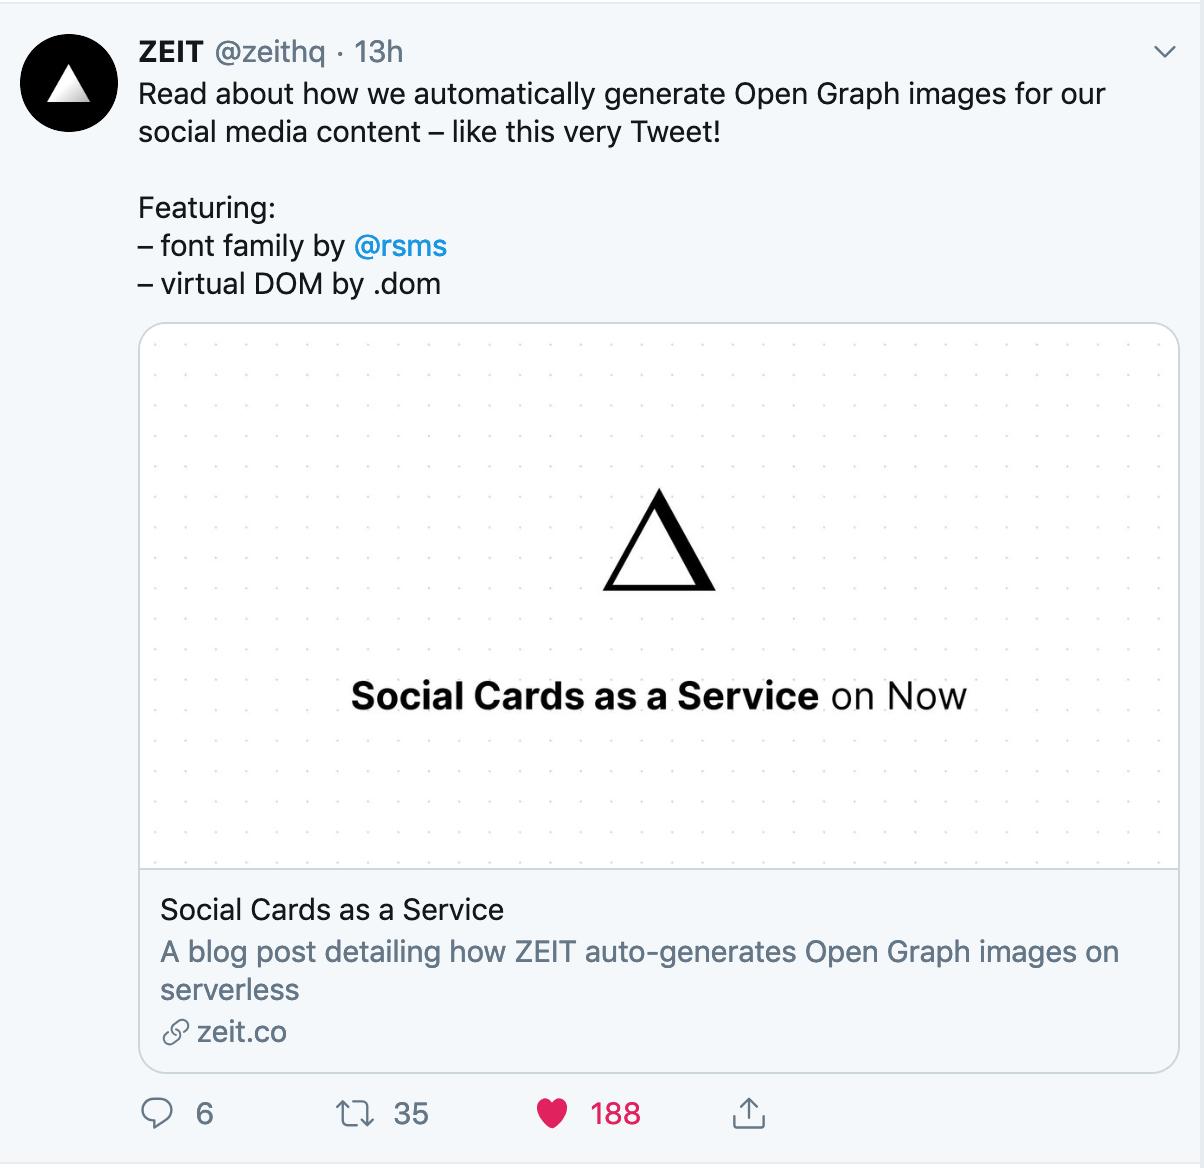 Open Graph Image as a Service